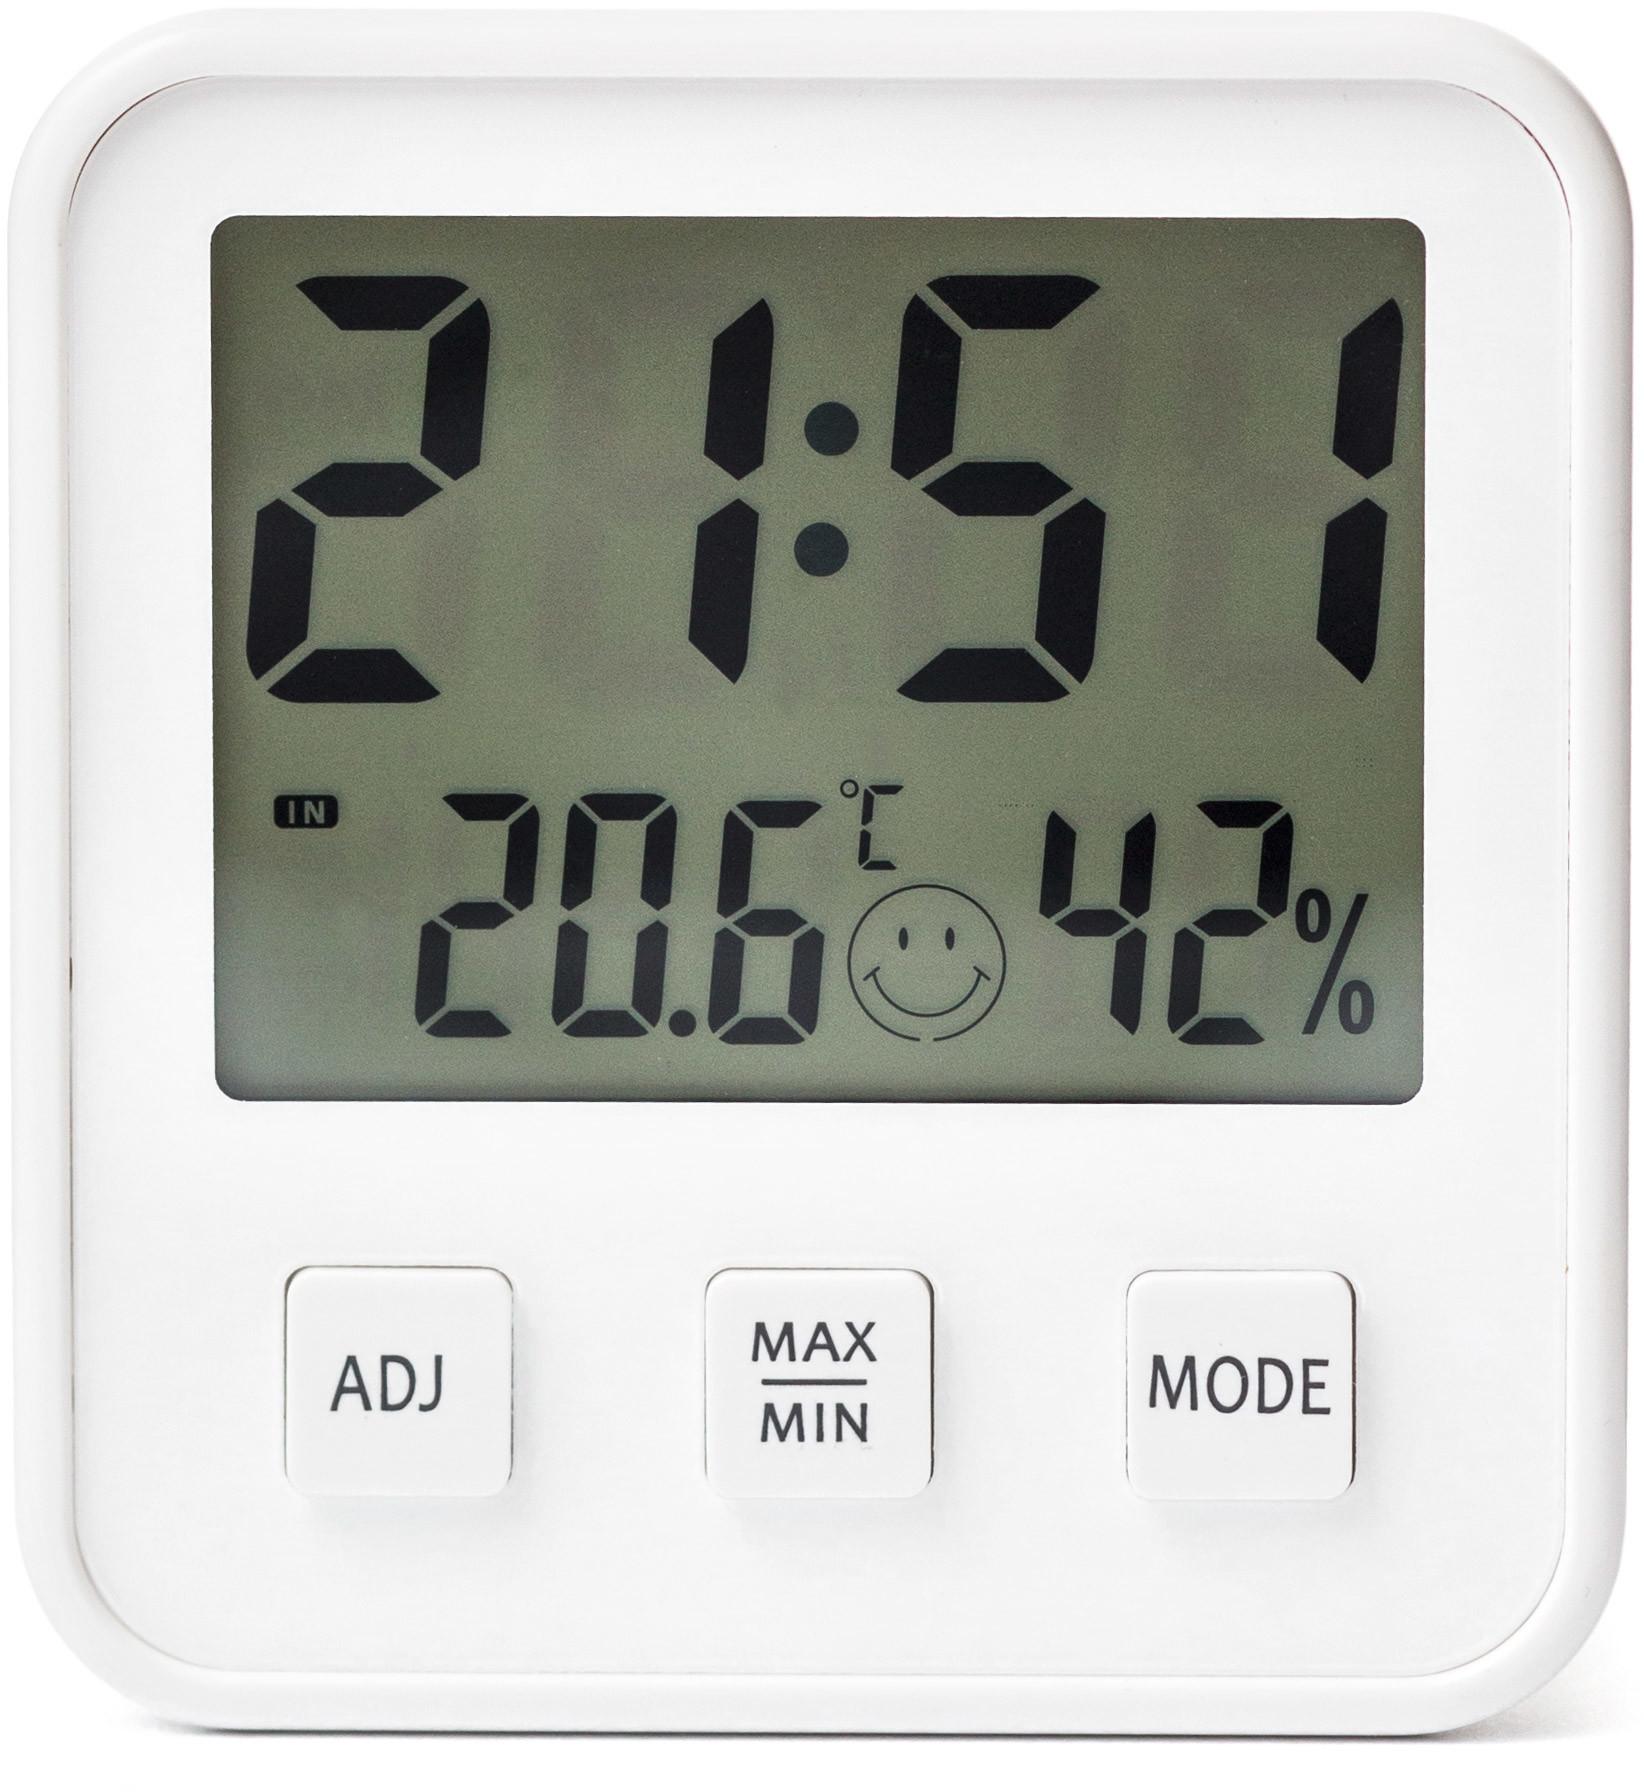 VITAMMY VITAMMY HYGRO Stacja pogody: higrometr, termometr TOW008973